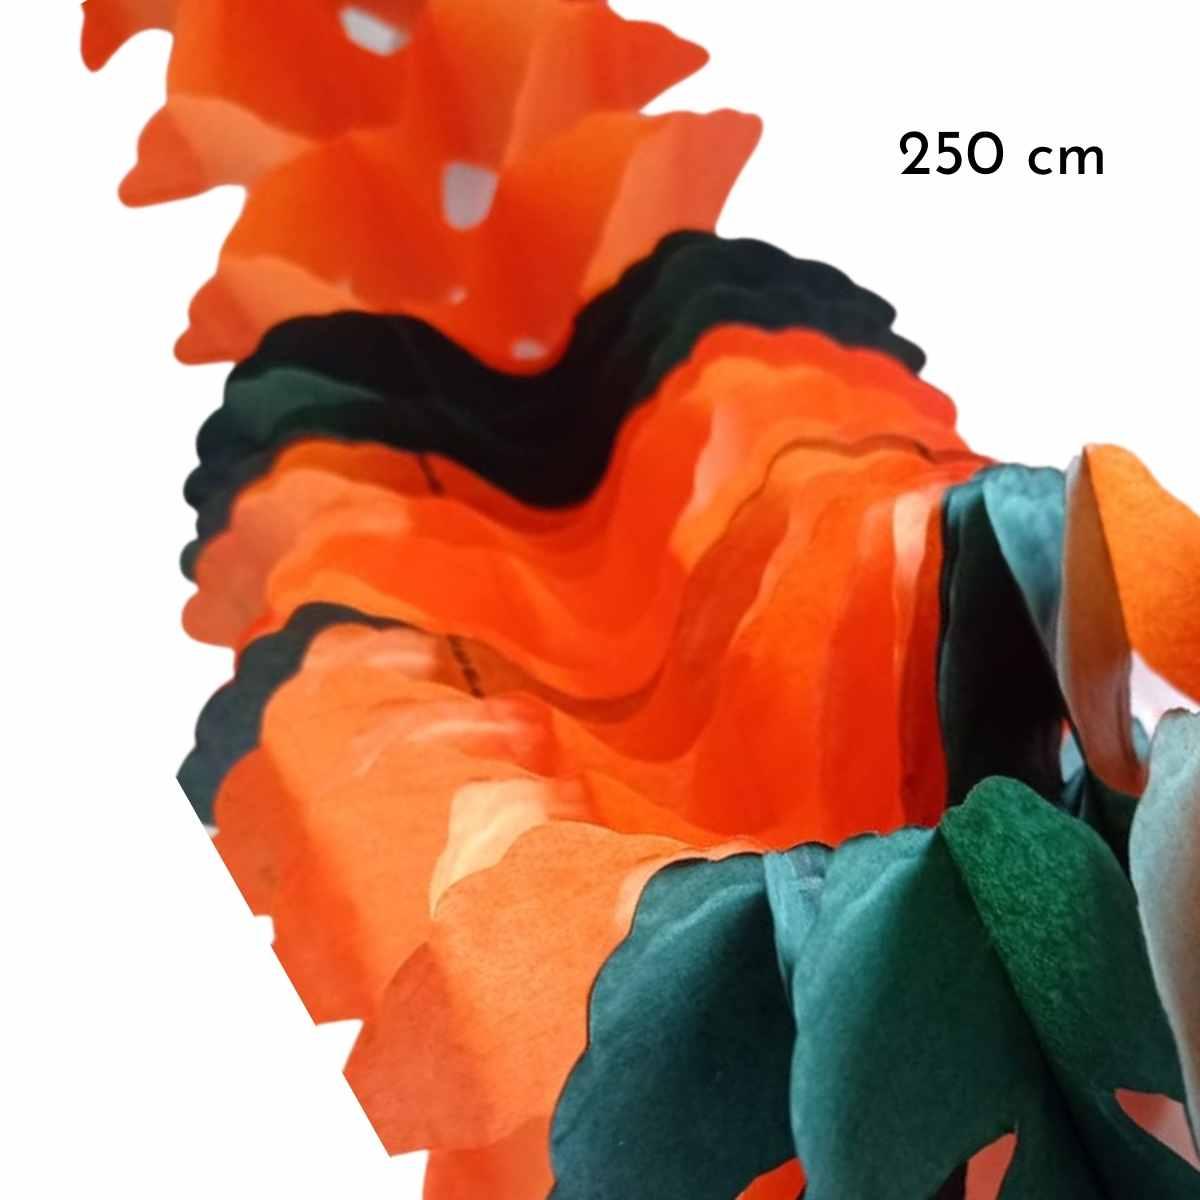 Guirlanda Halloween em formato X 2,50cm